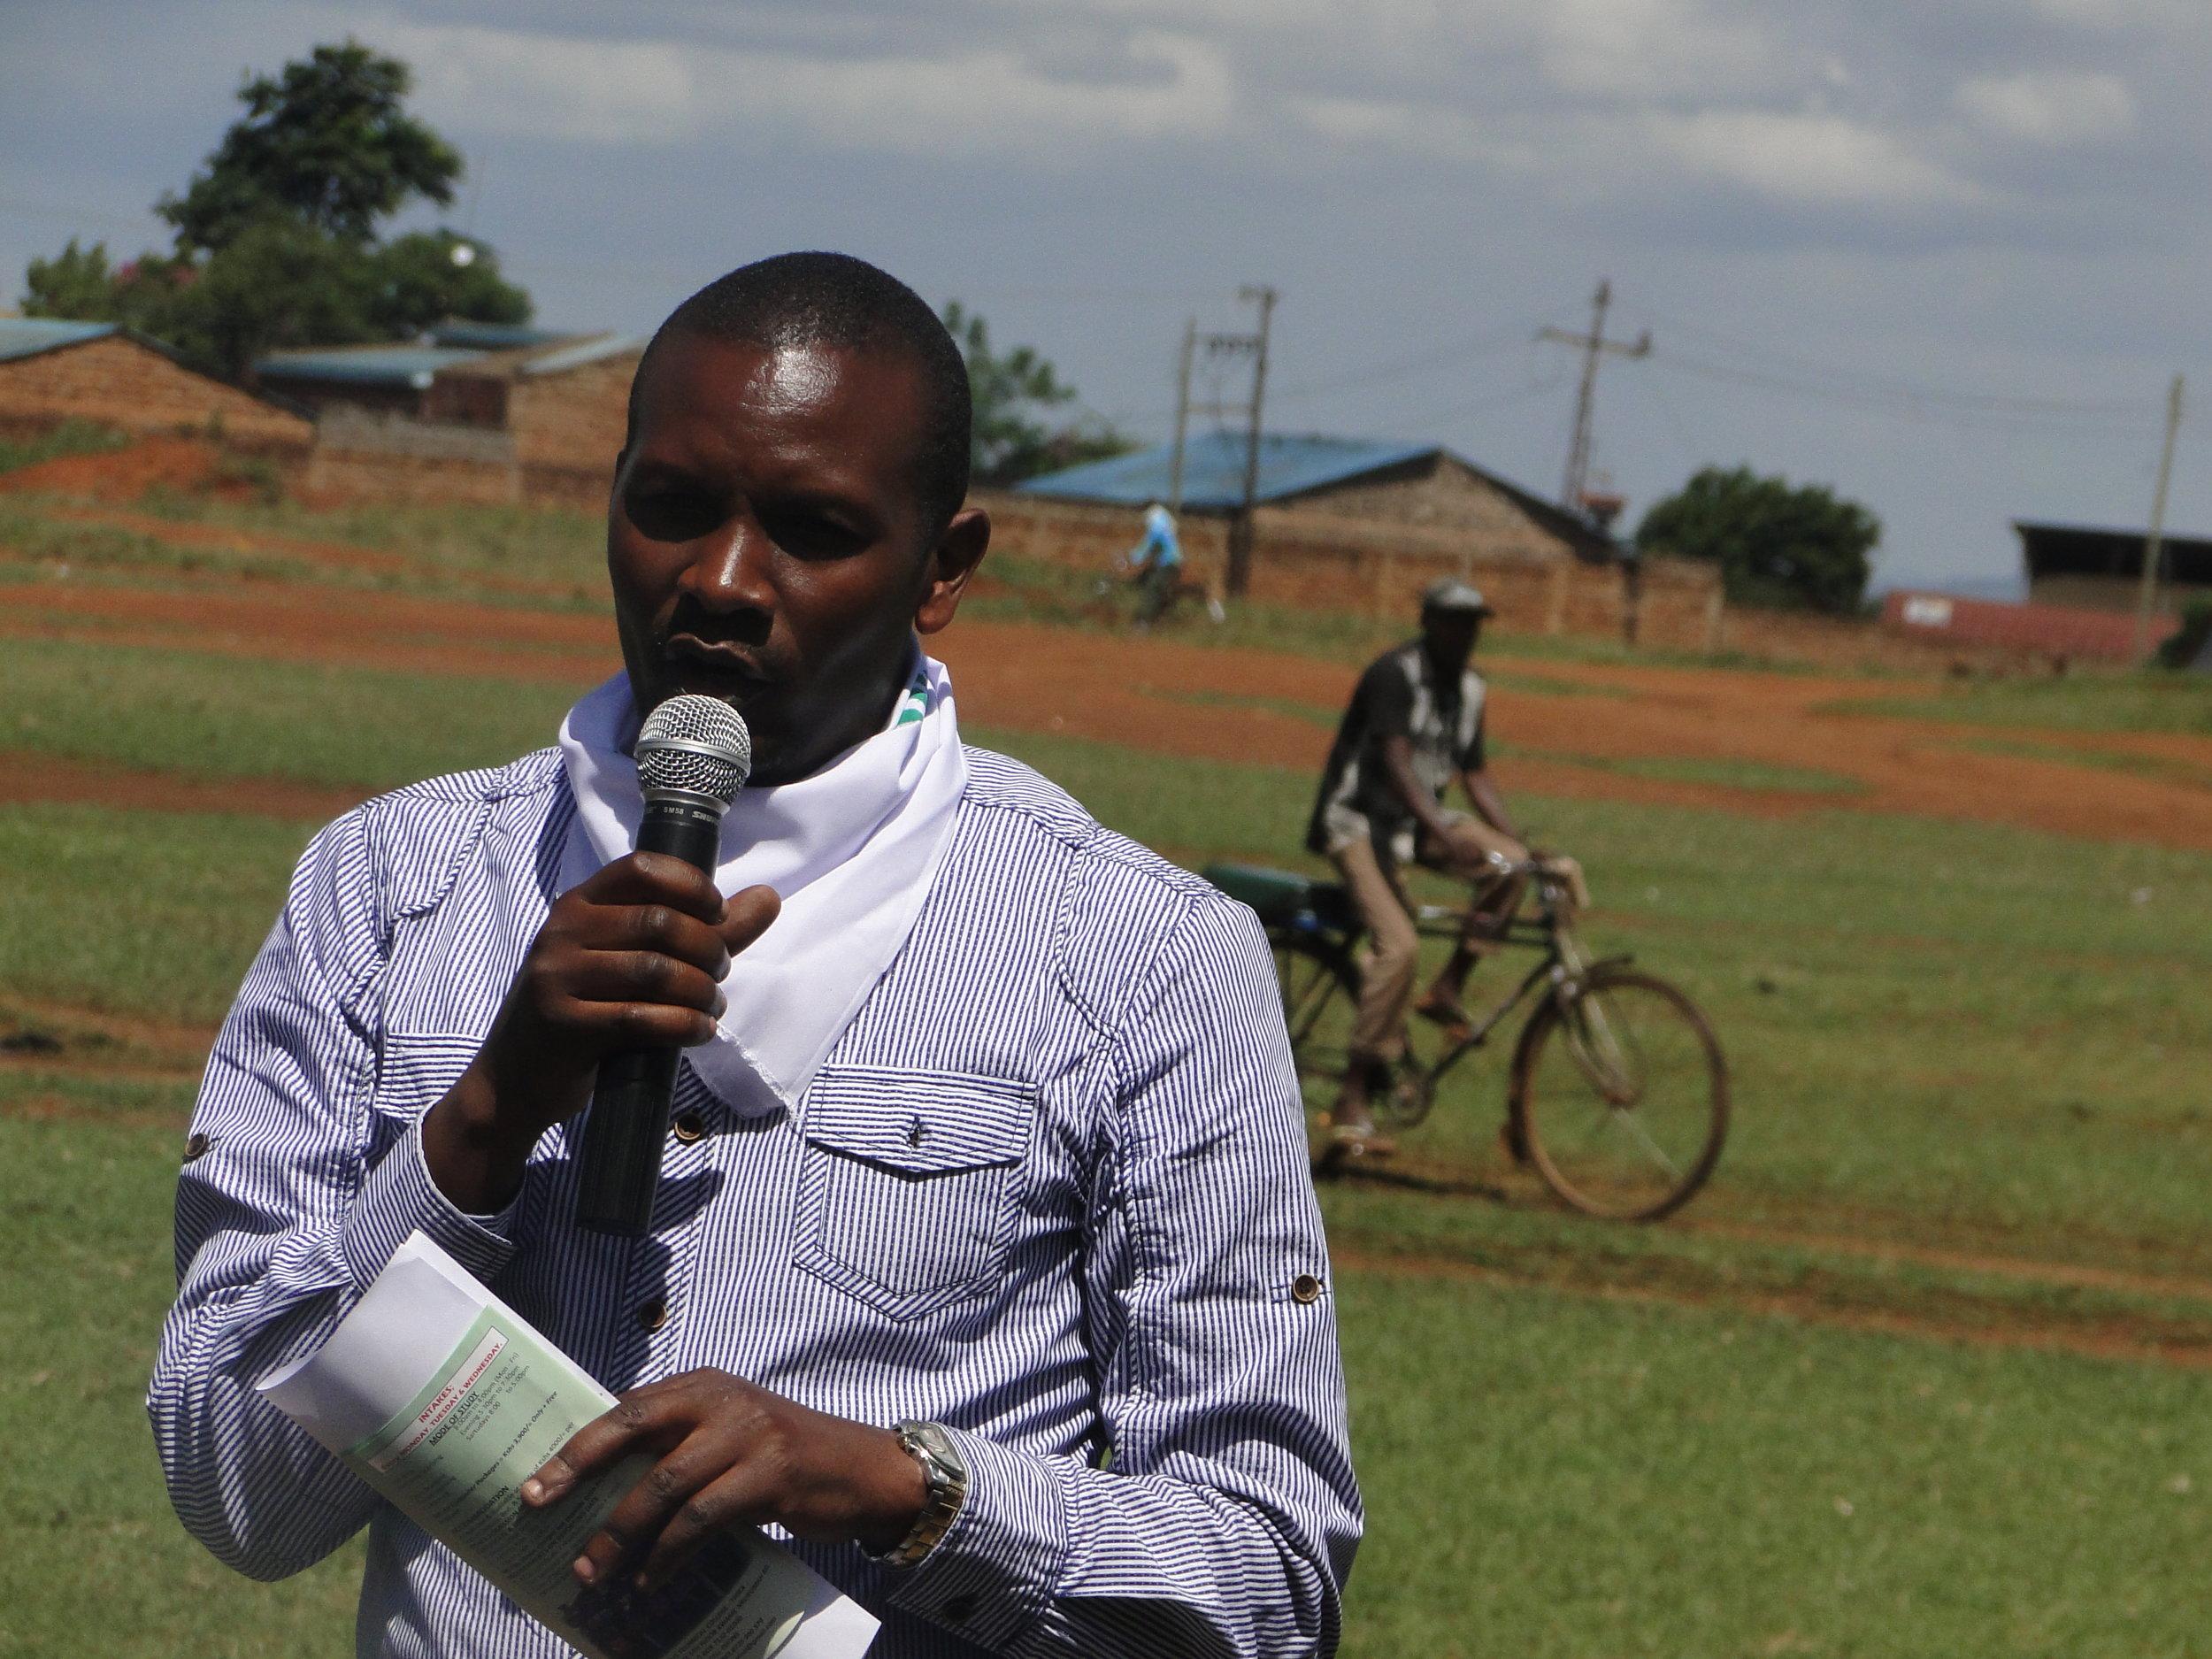 Rashid Mutua addresses the participants.